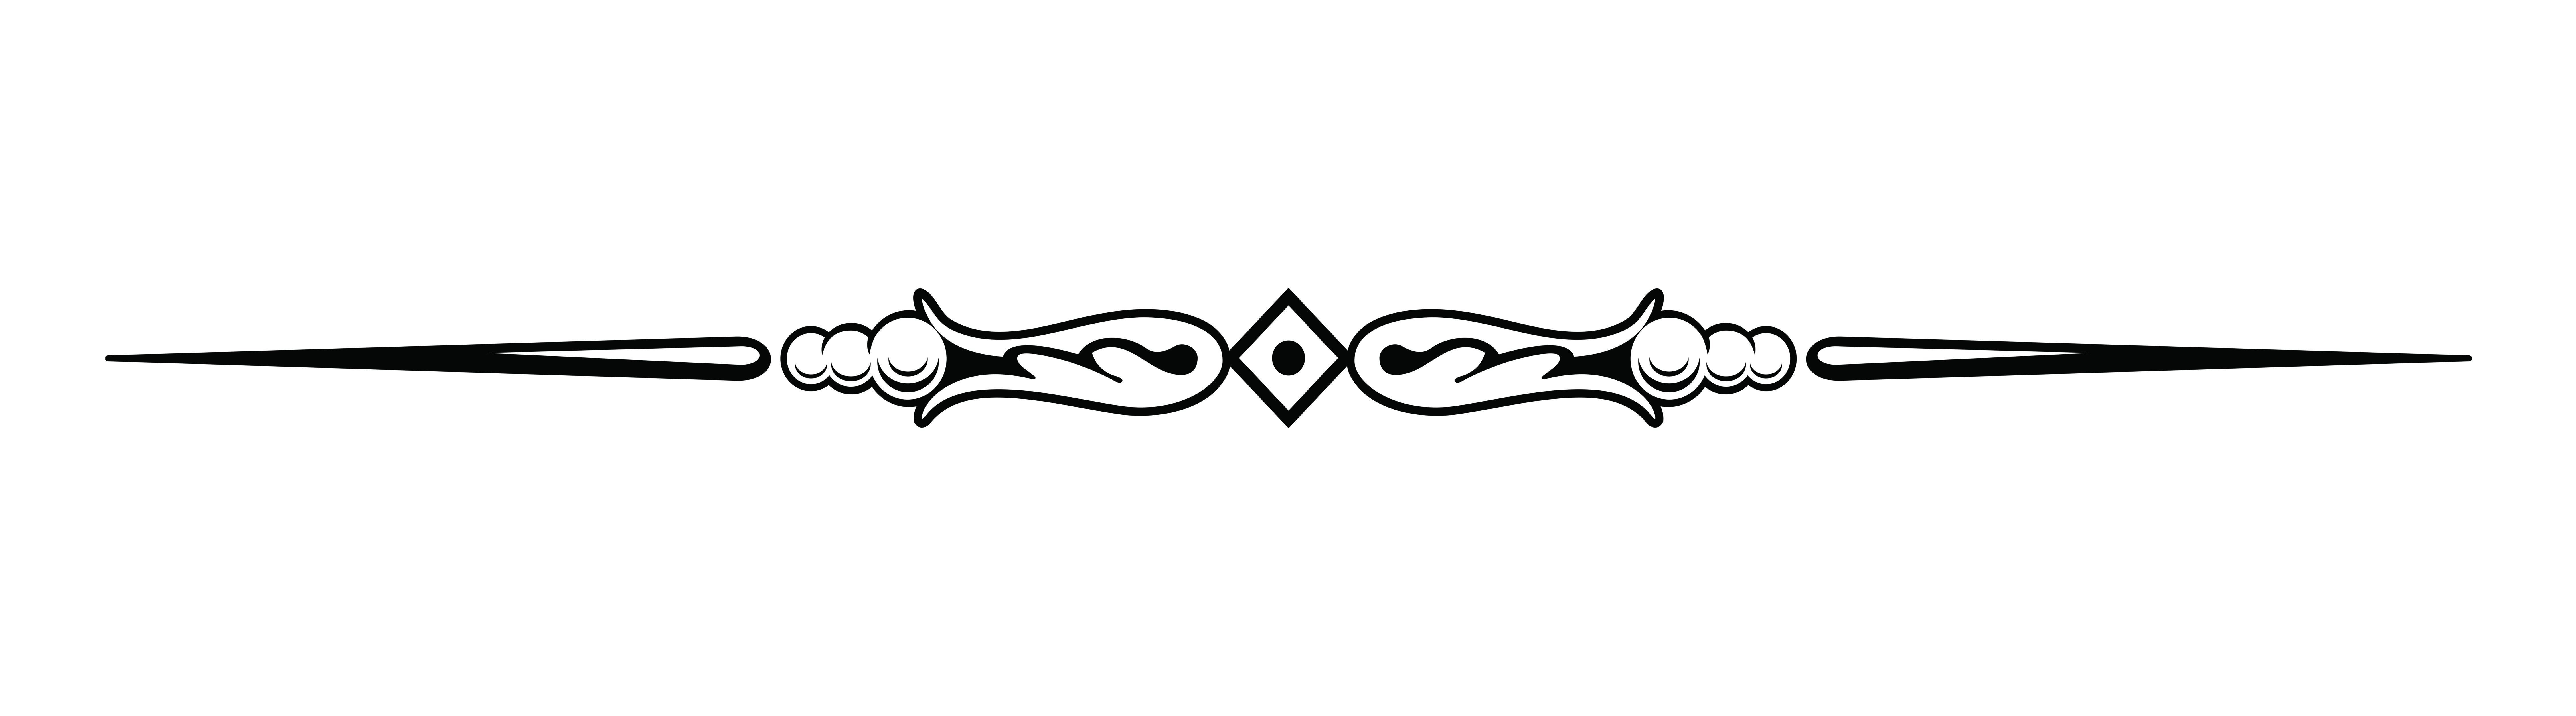 Decorative Line Dividers Clip Art-Decorative Line Dividers Clip Art-3